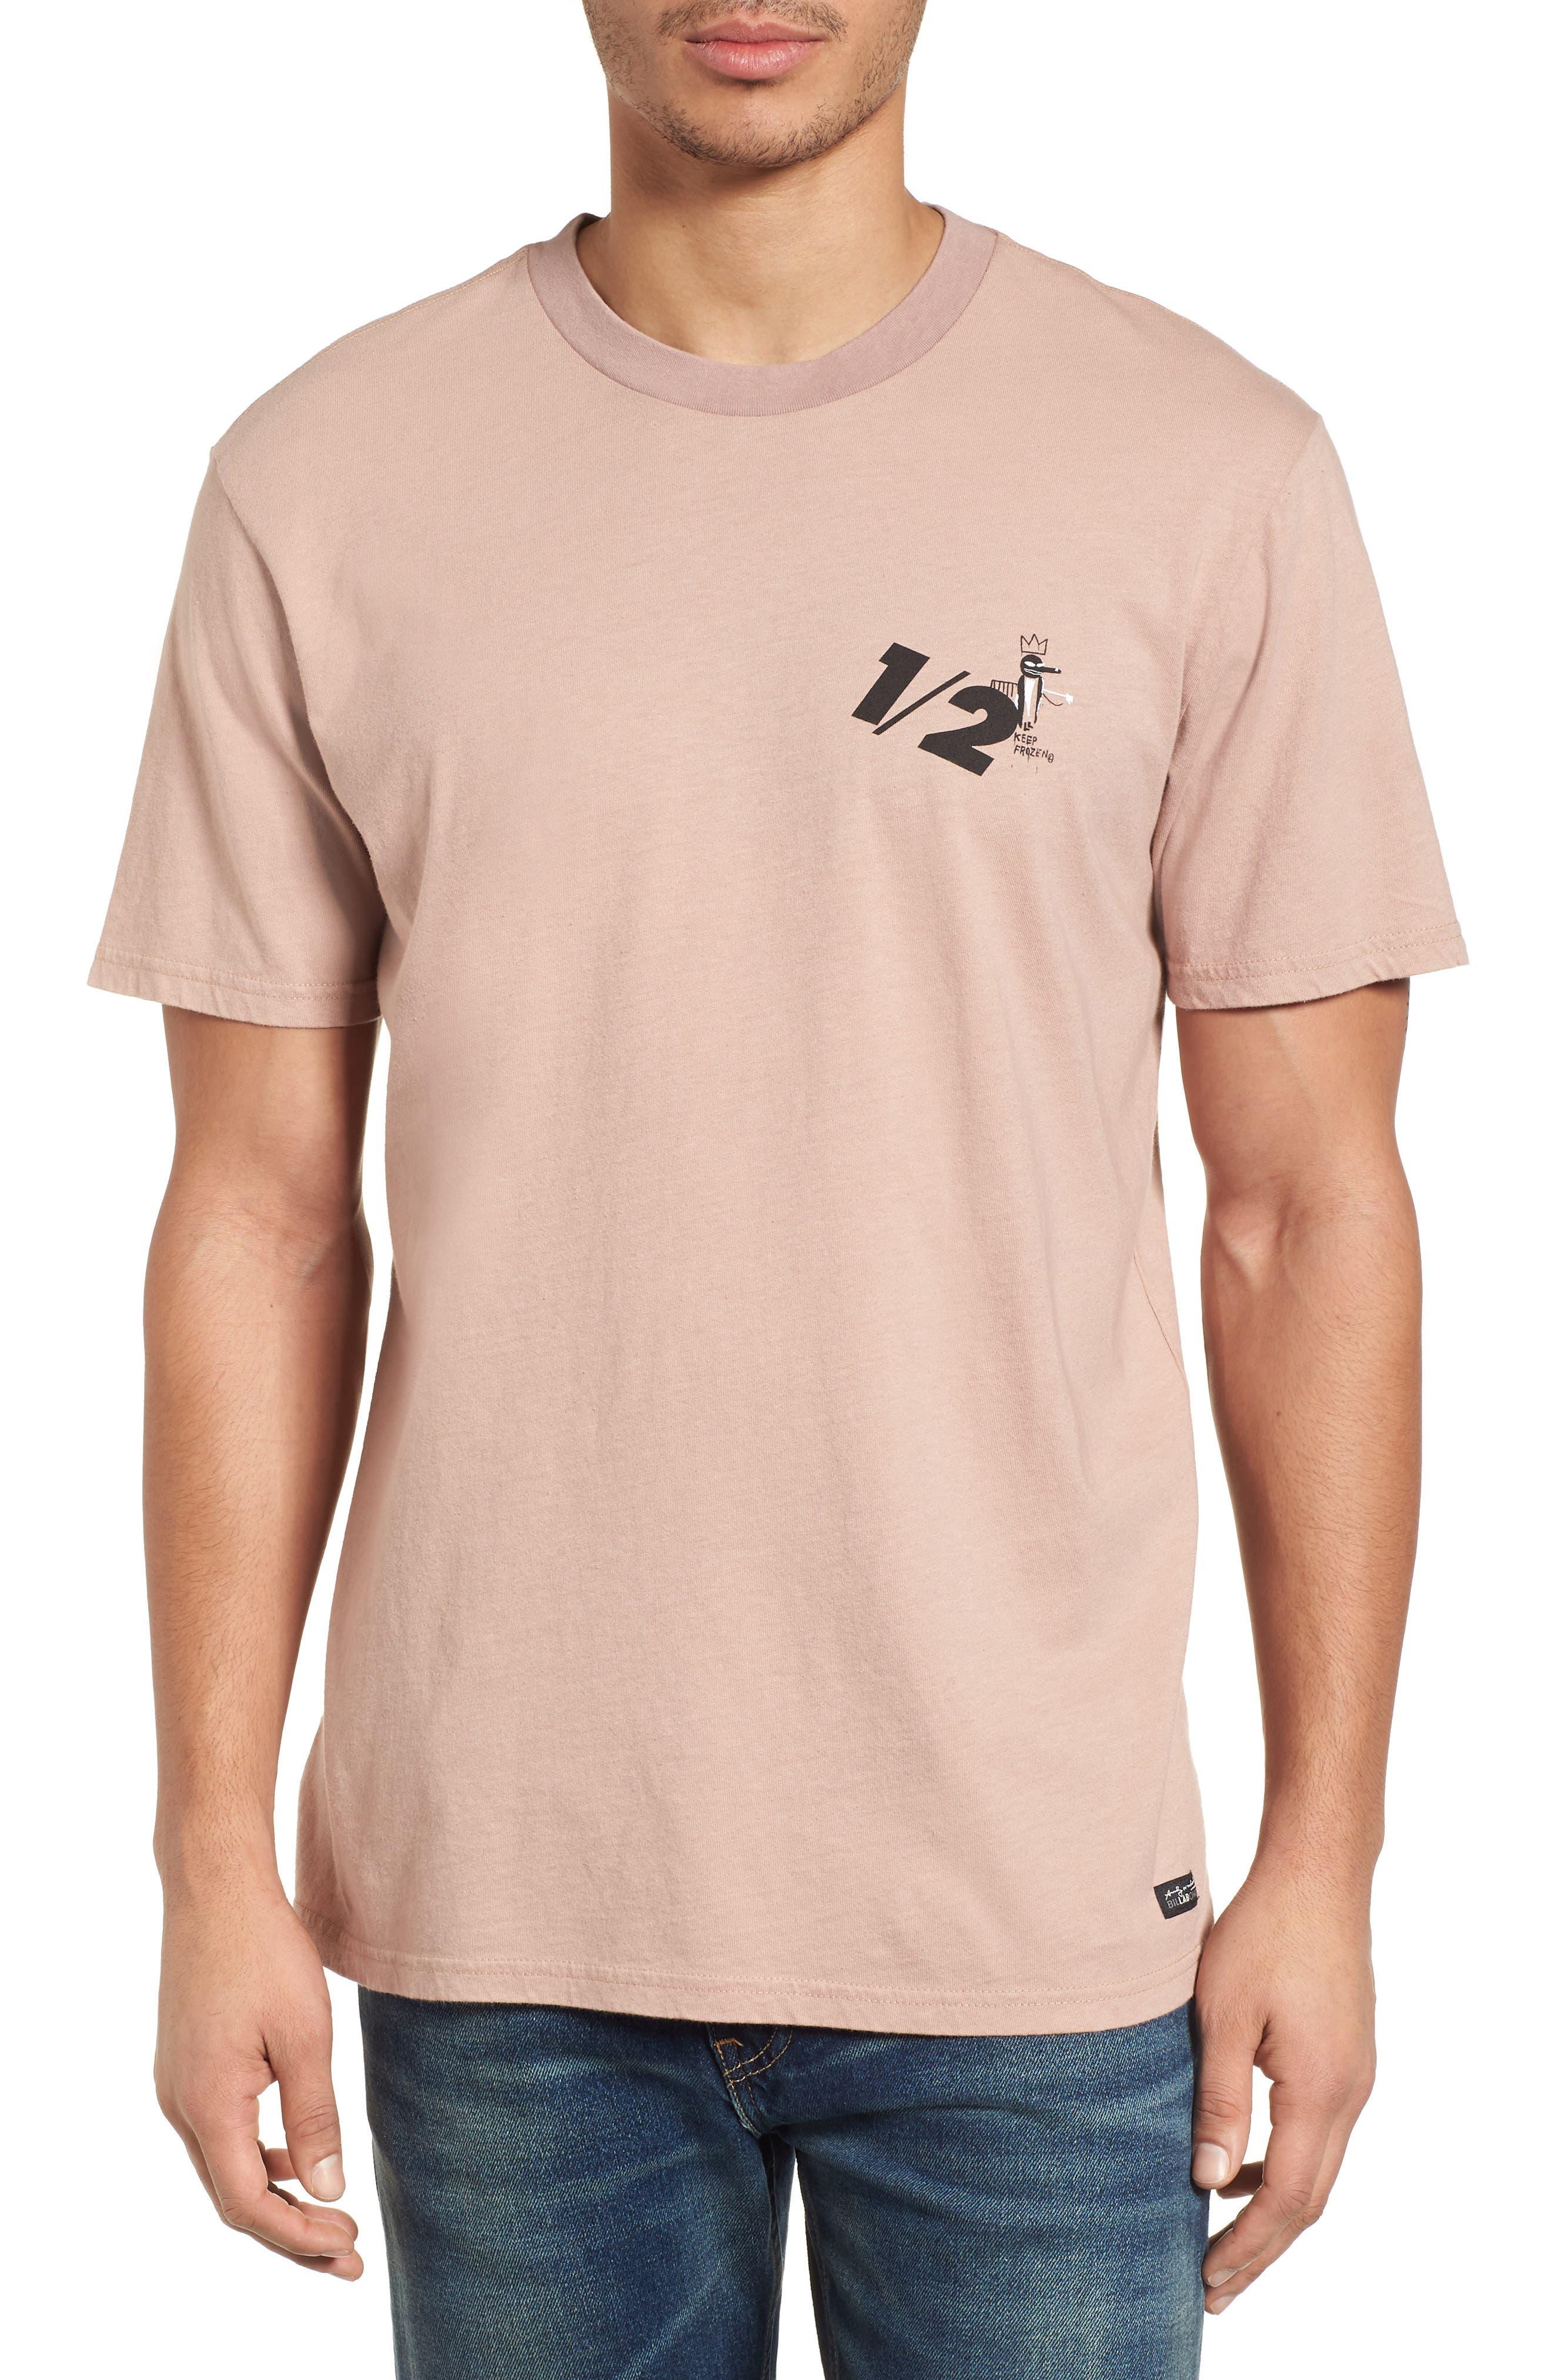 x Warhol Half T-Shirt,                         Main,                         color, Ash Rose